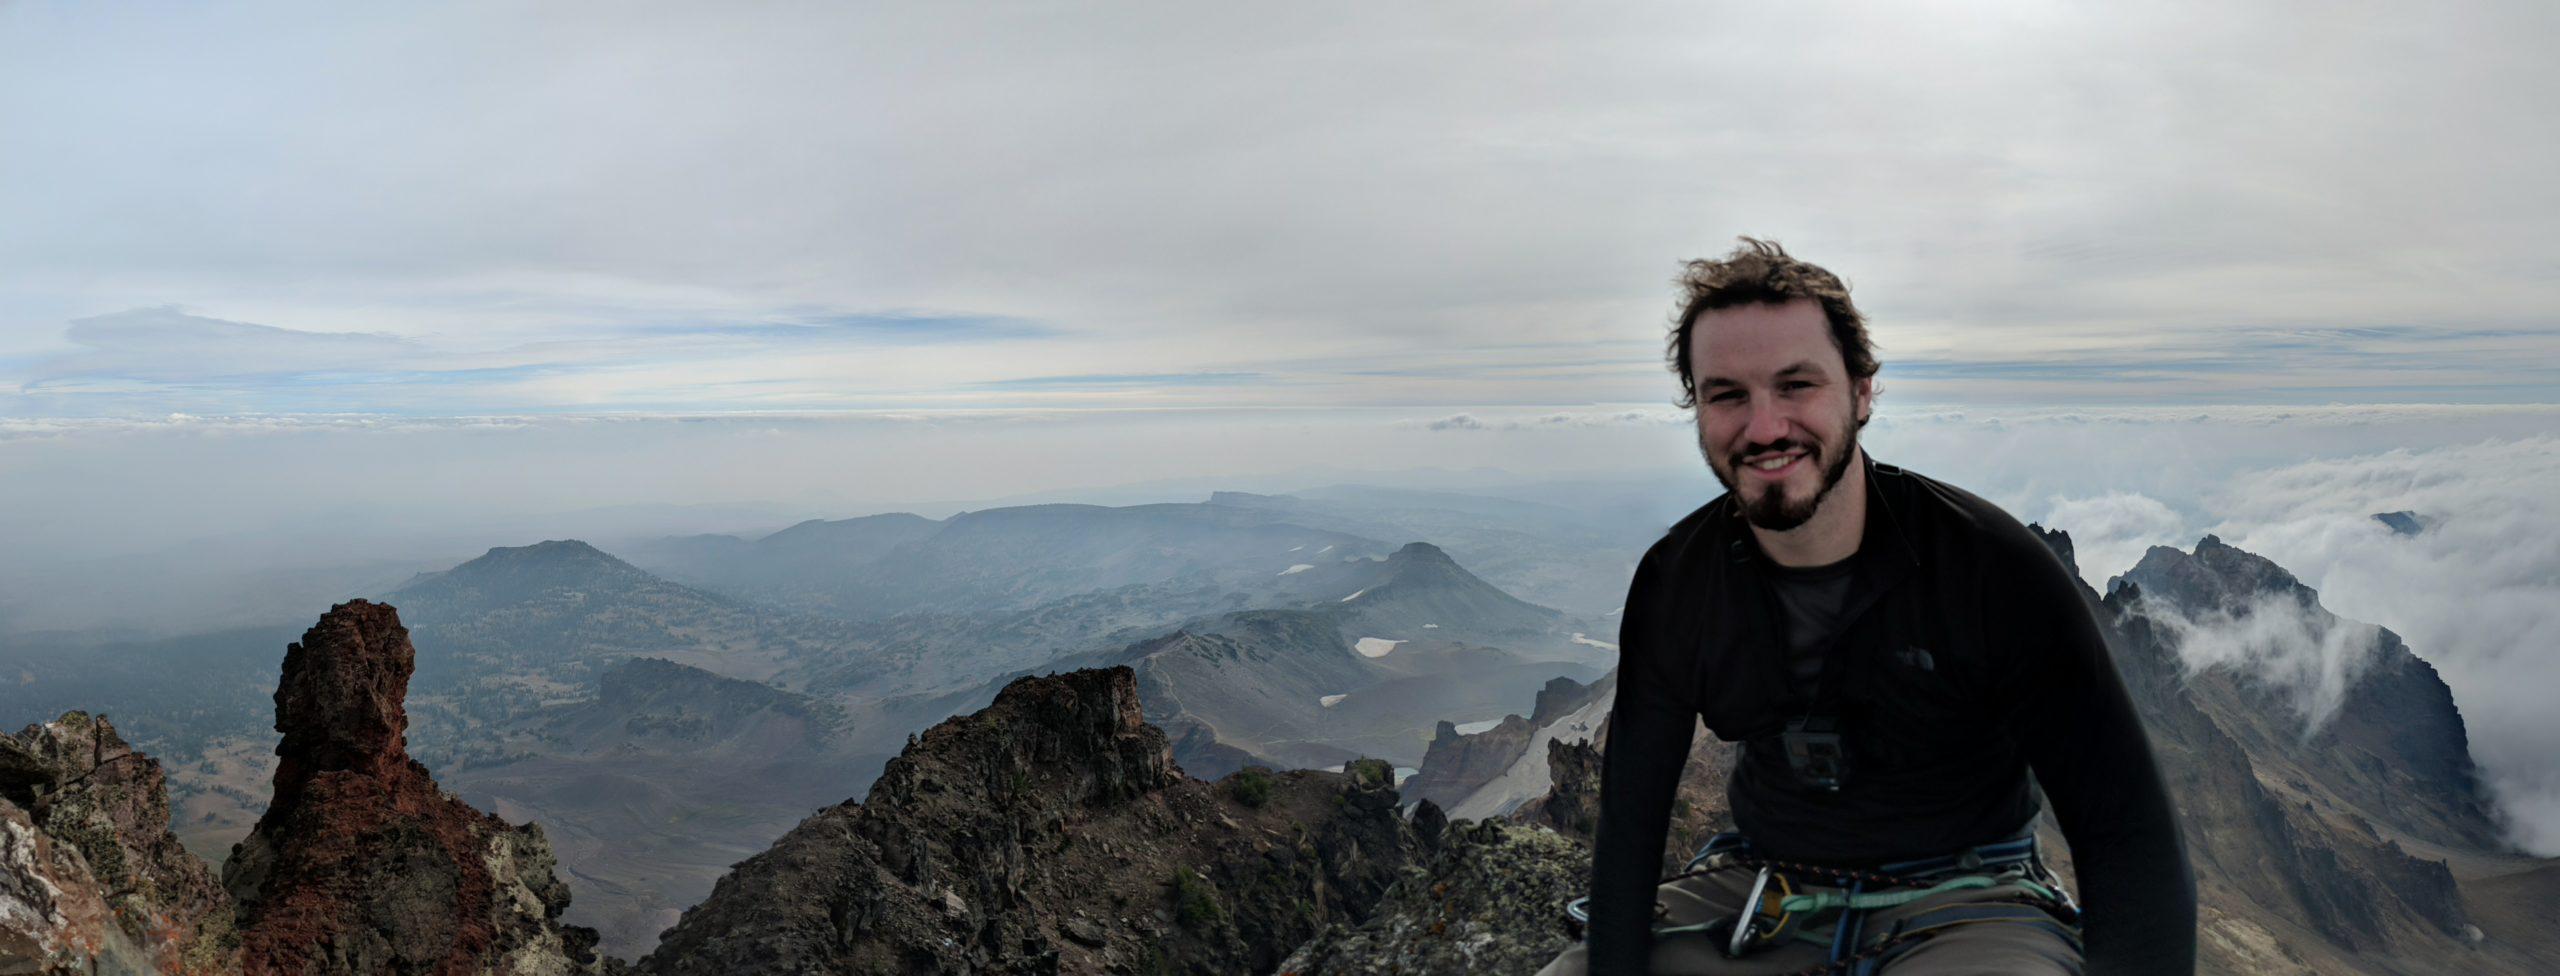 Mountain Climbing Oregon Matt Cook